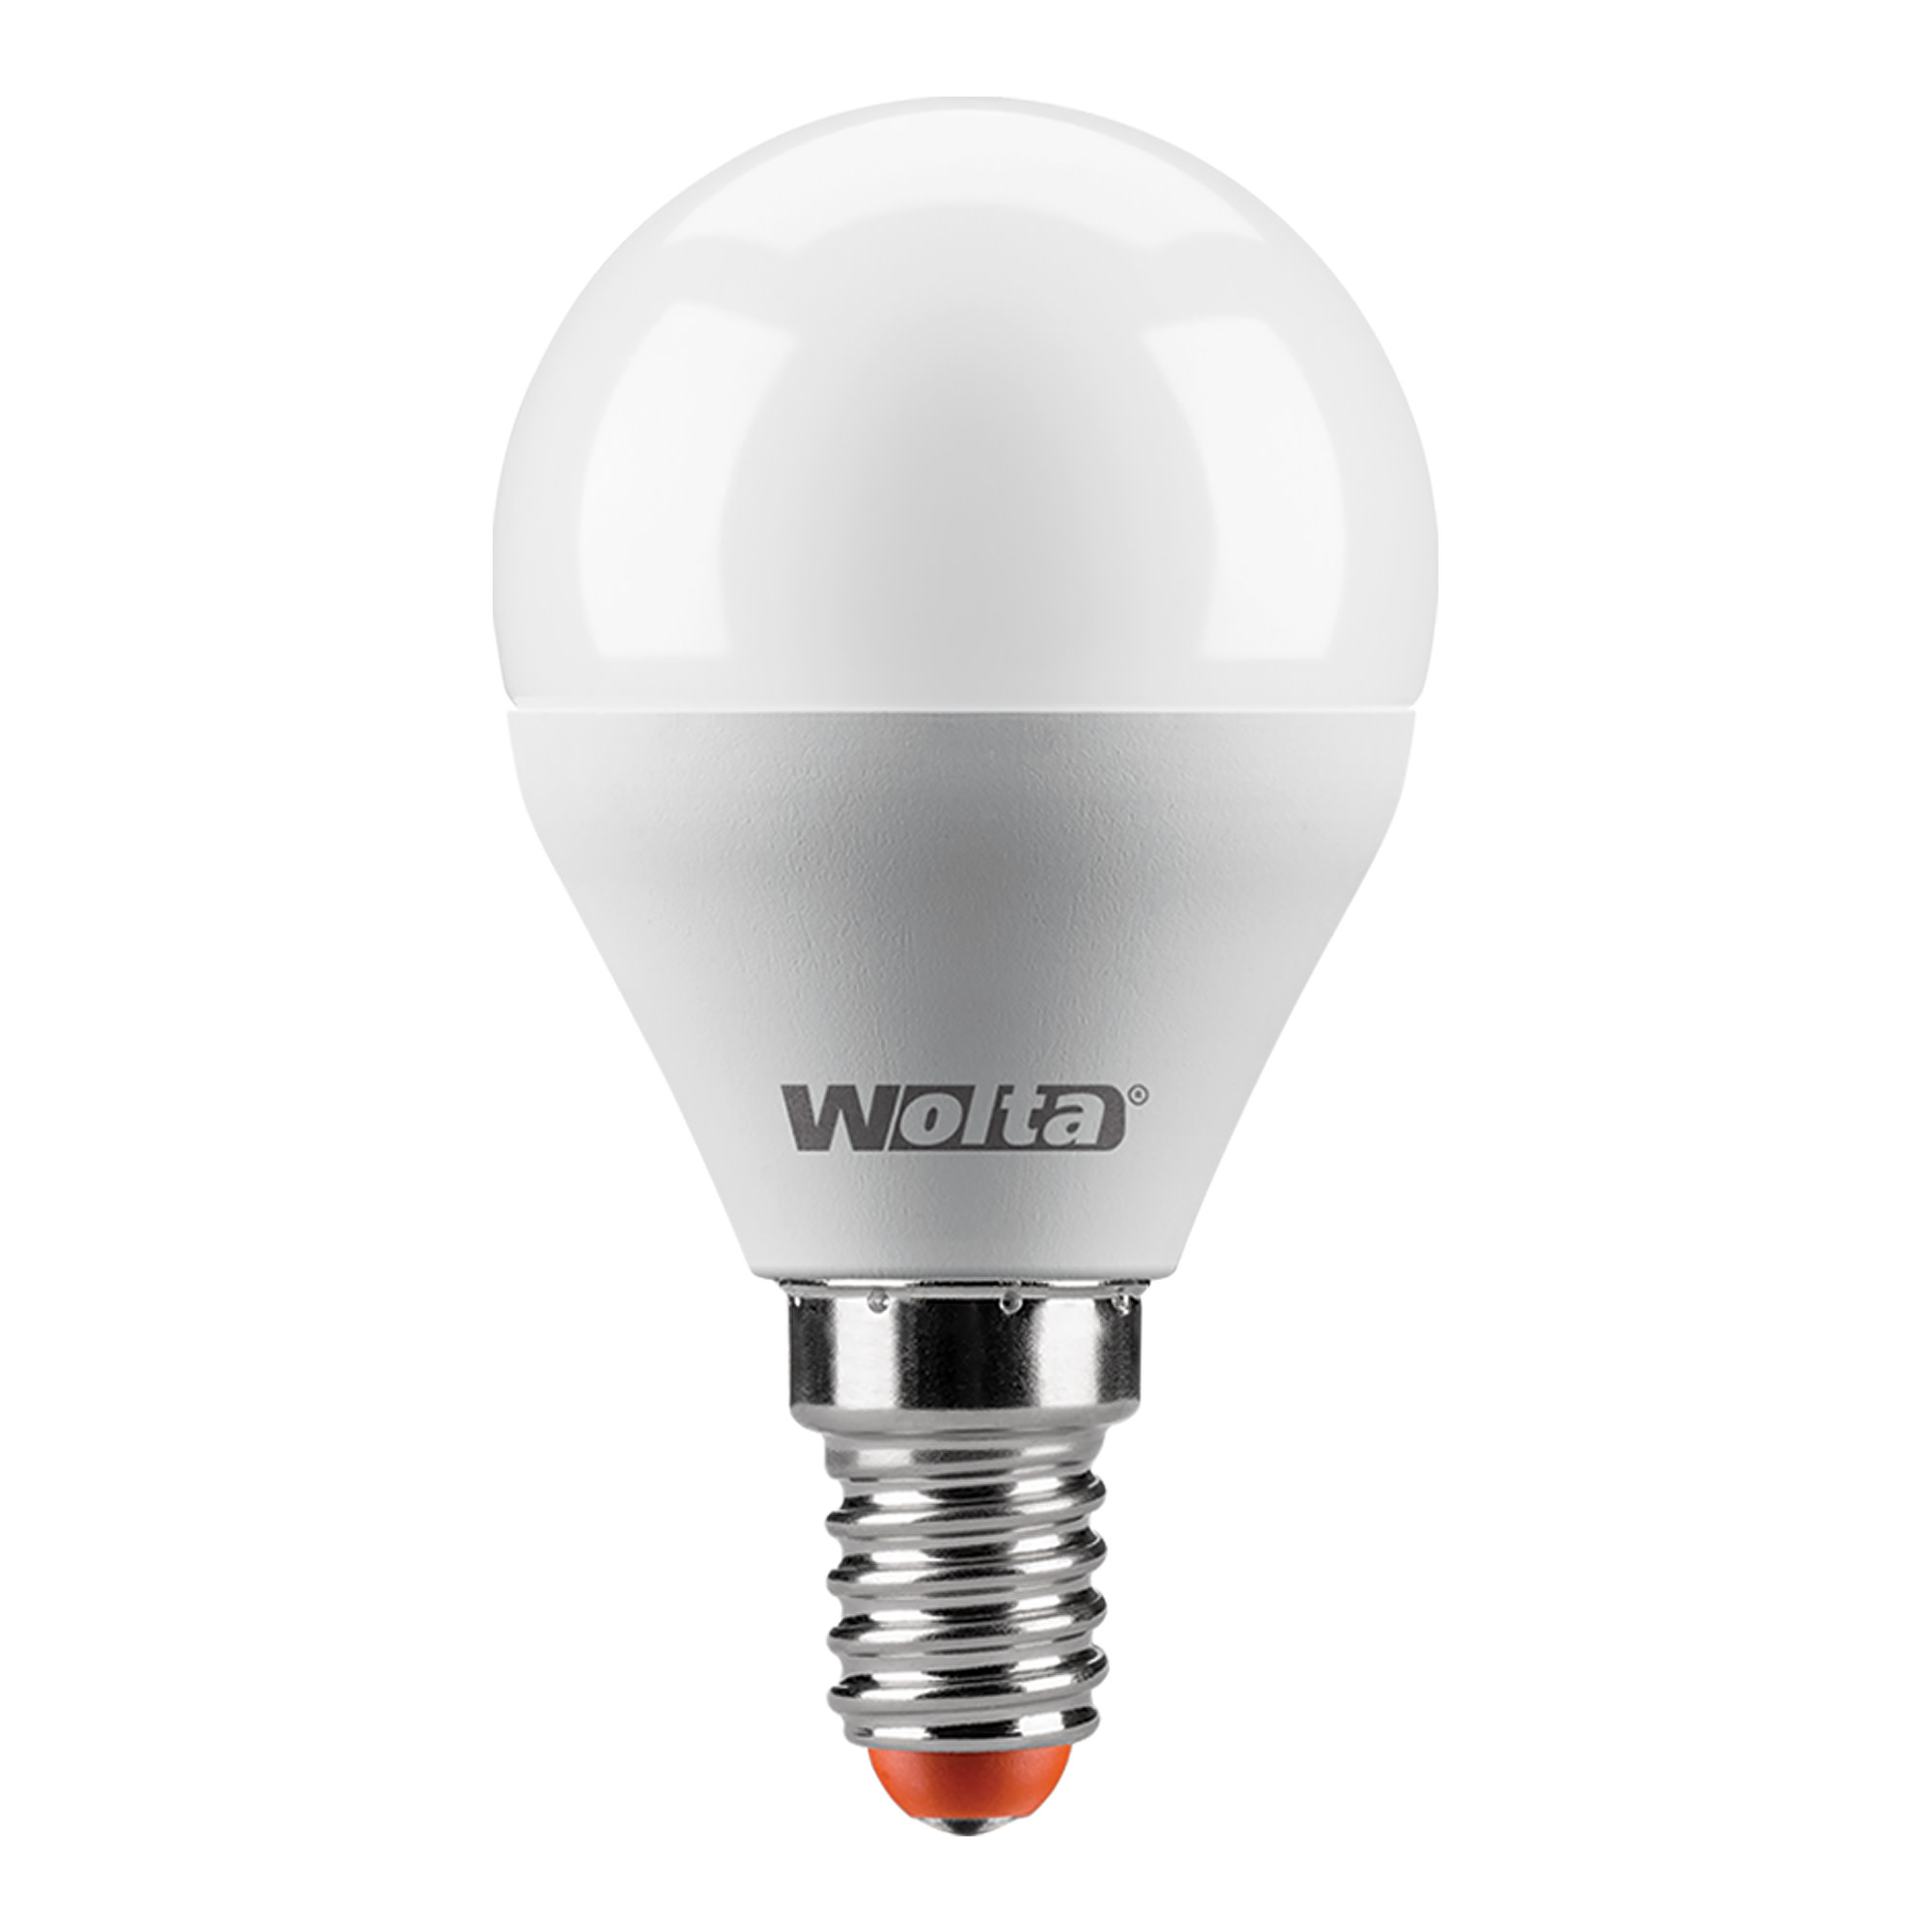 Лампа светодиодная Wolta шар E14 8 Вт 800 Лм свет тёплый белый